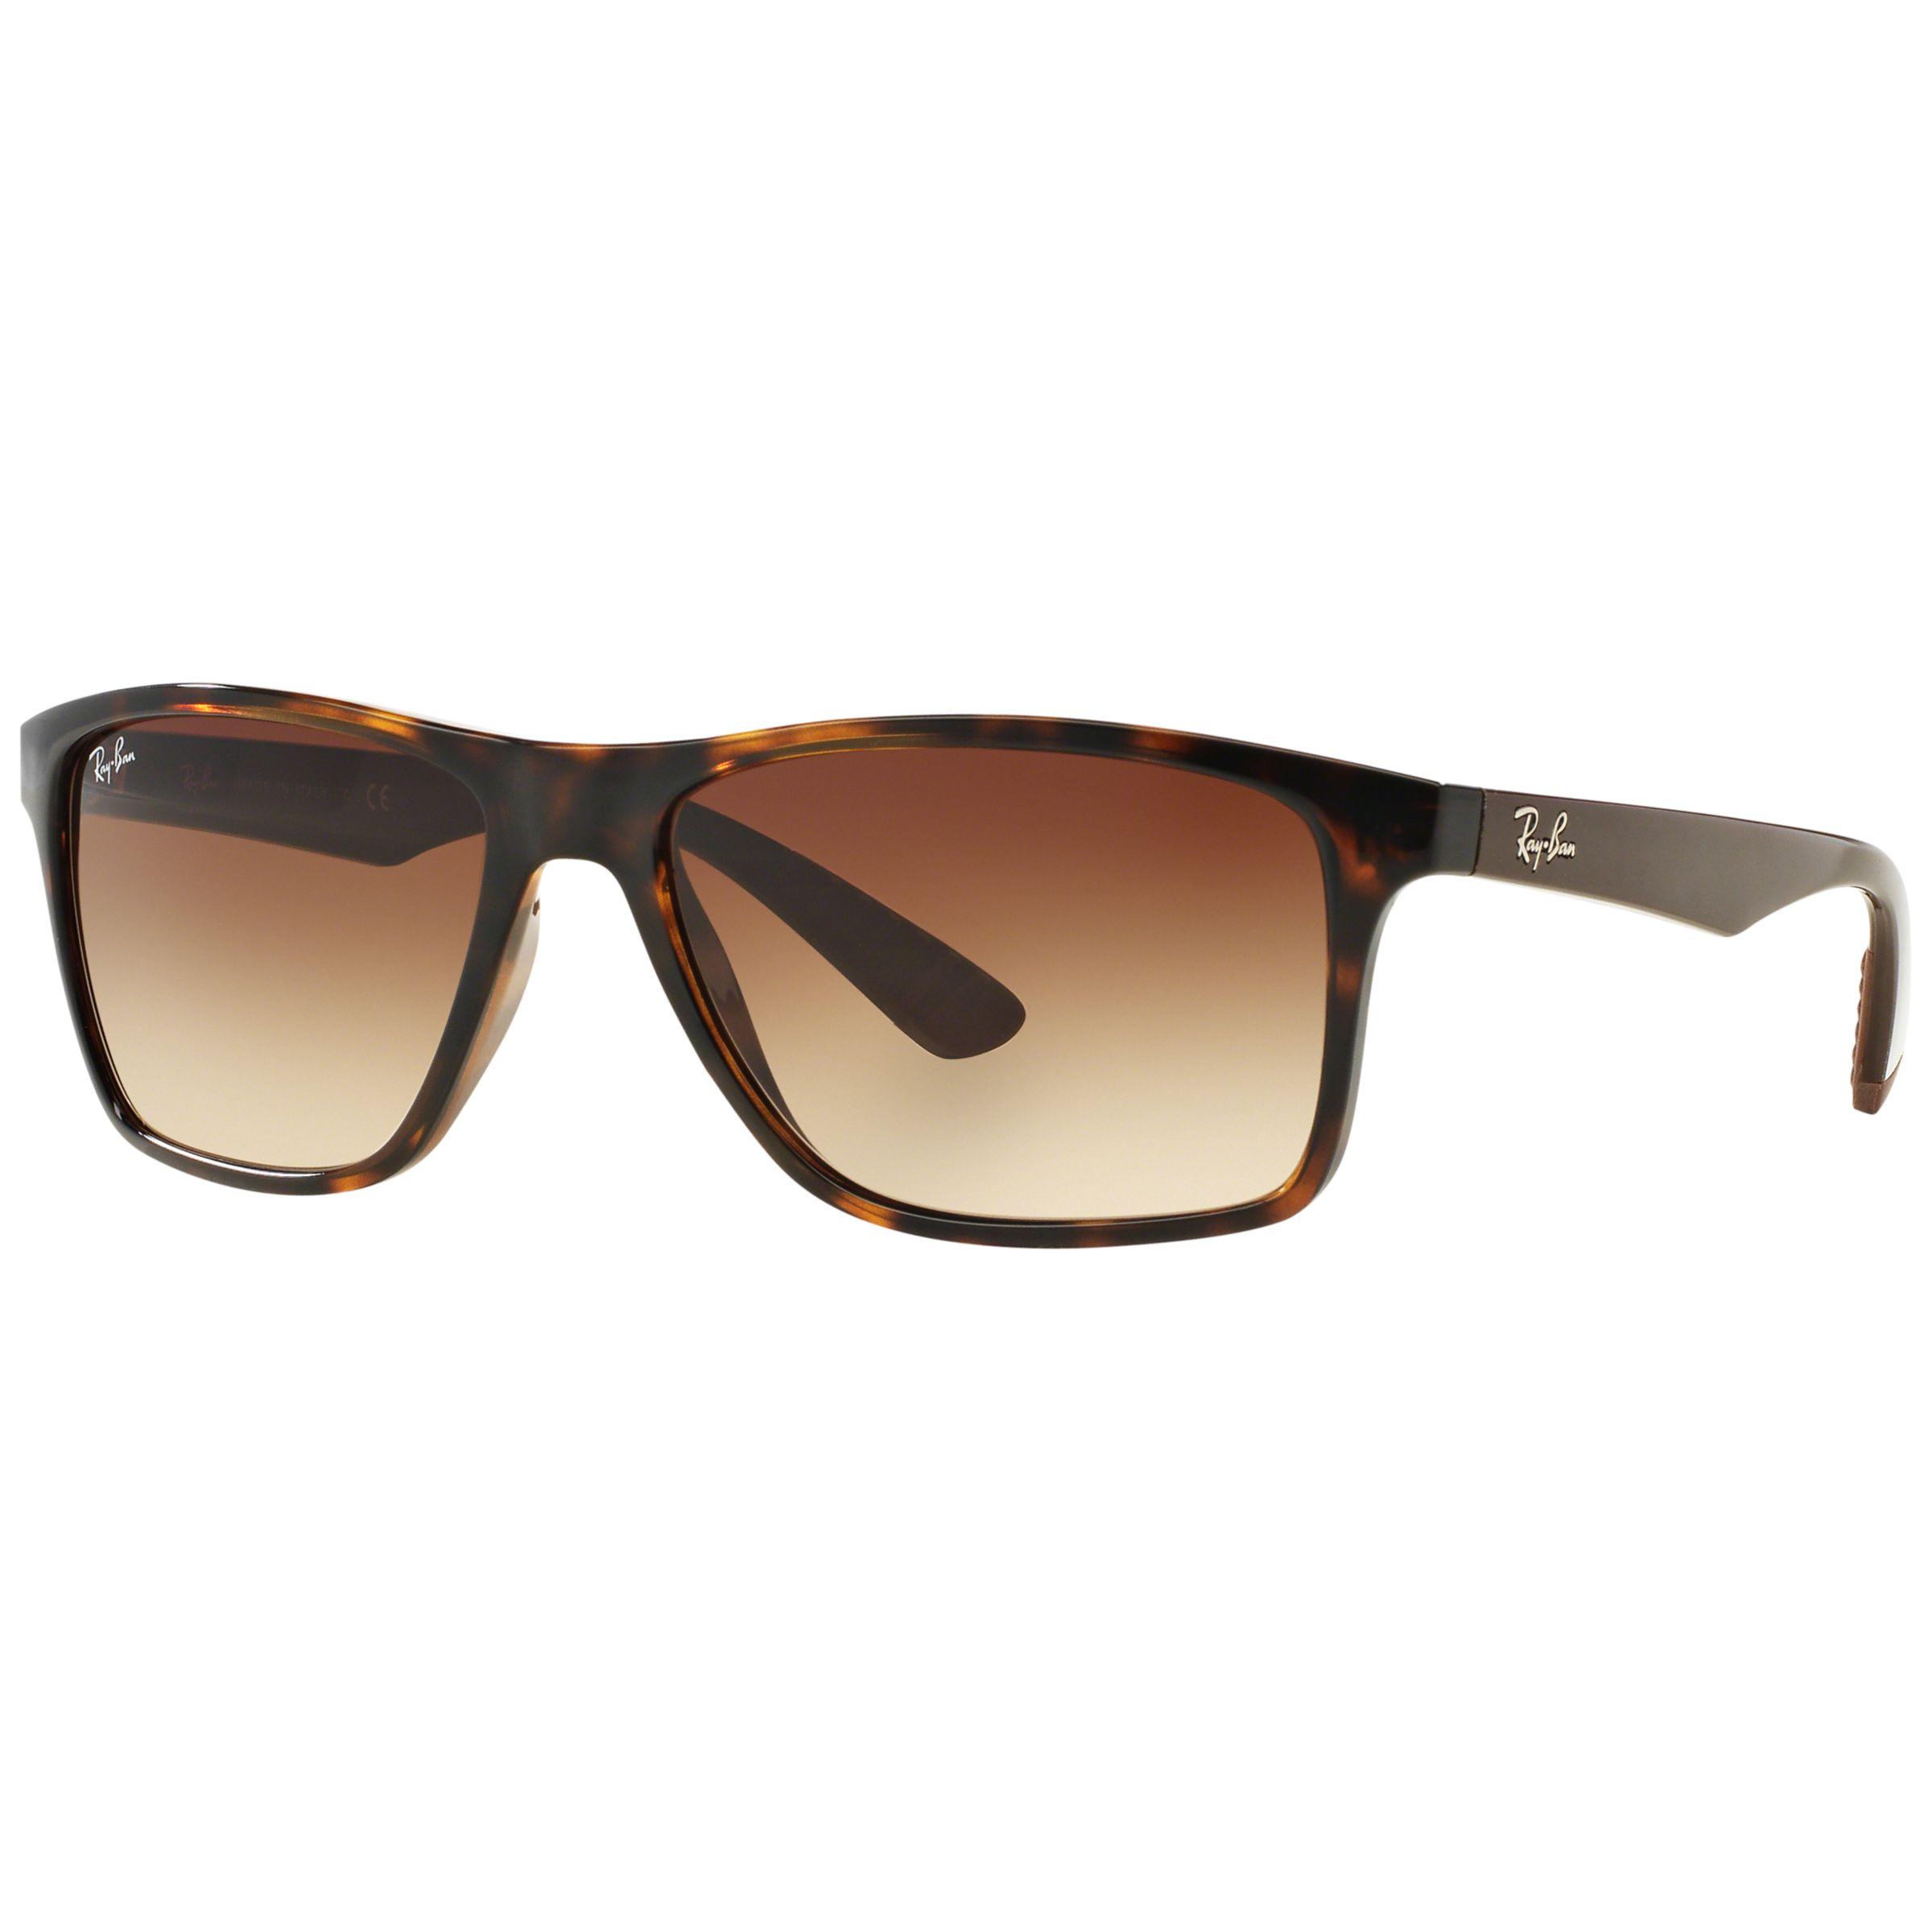 Ray-ban Ray-Ban RB4234 Rectangular Sunglasses